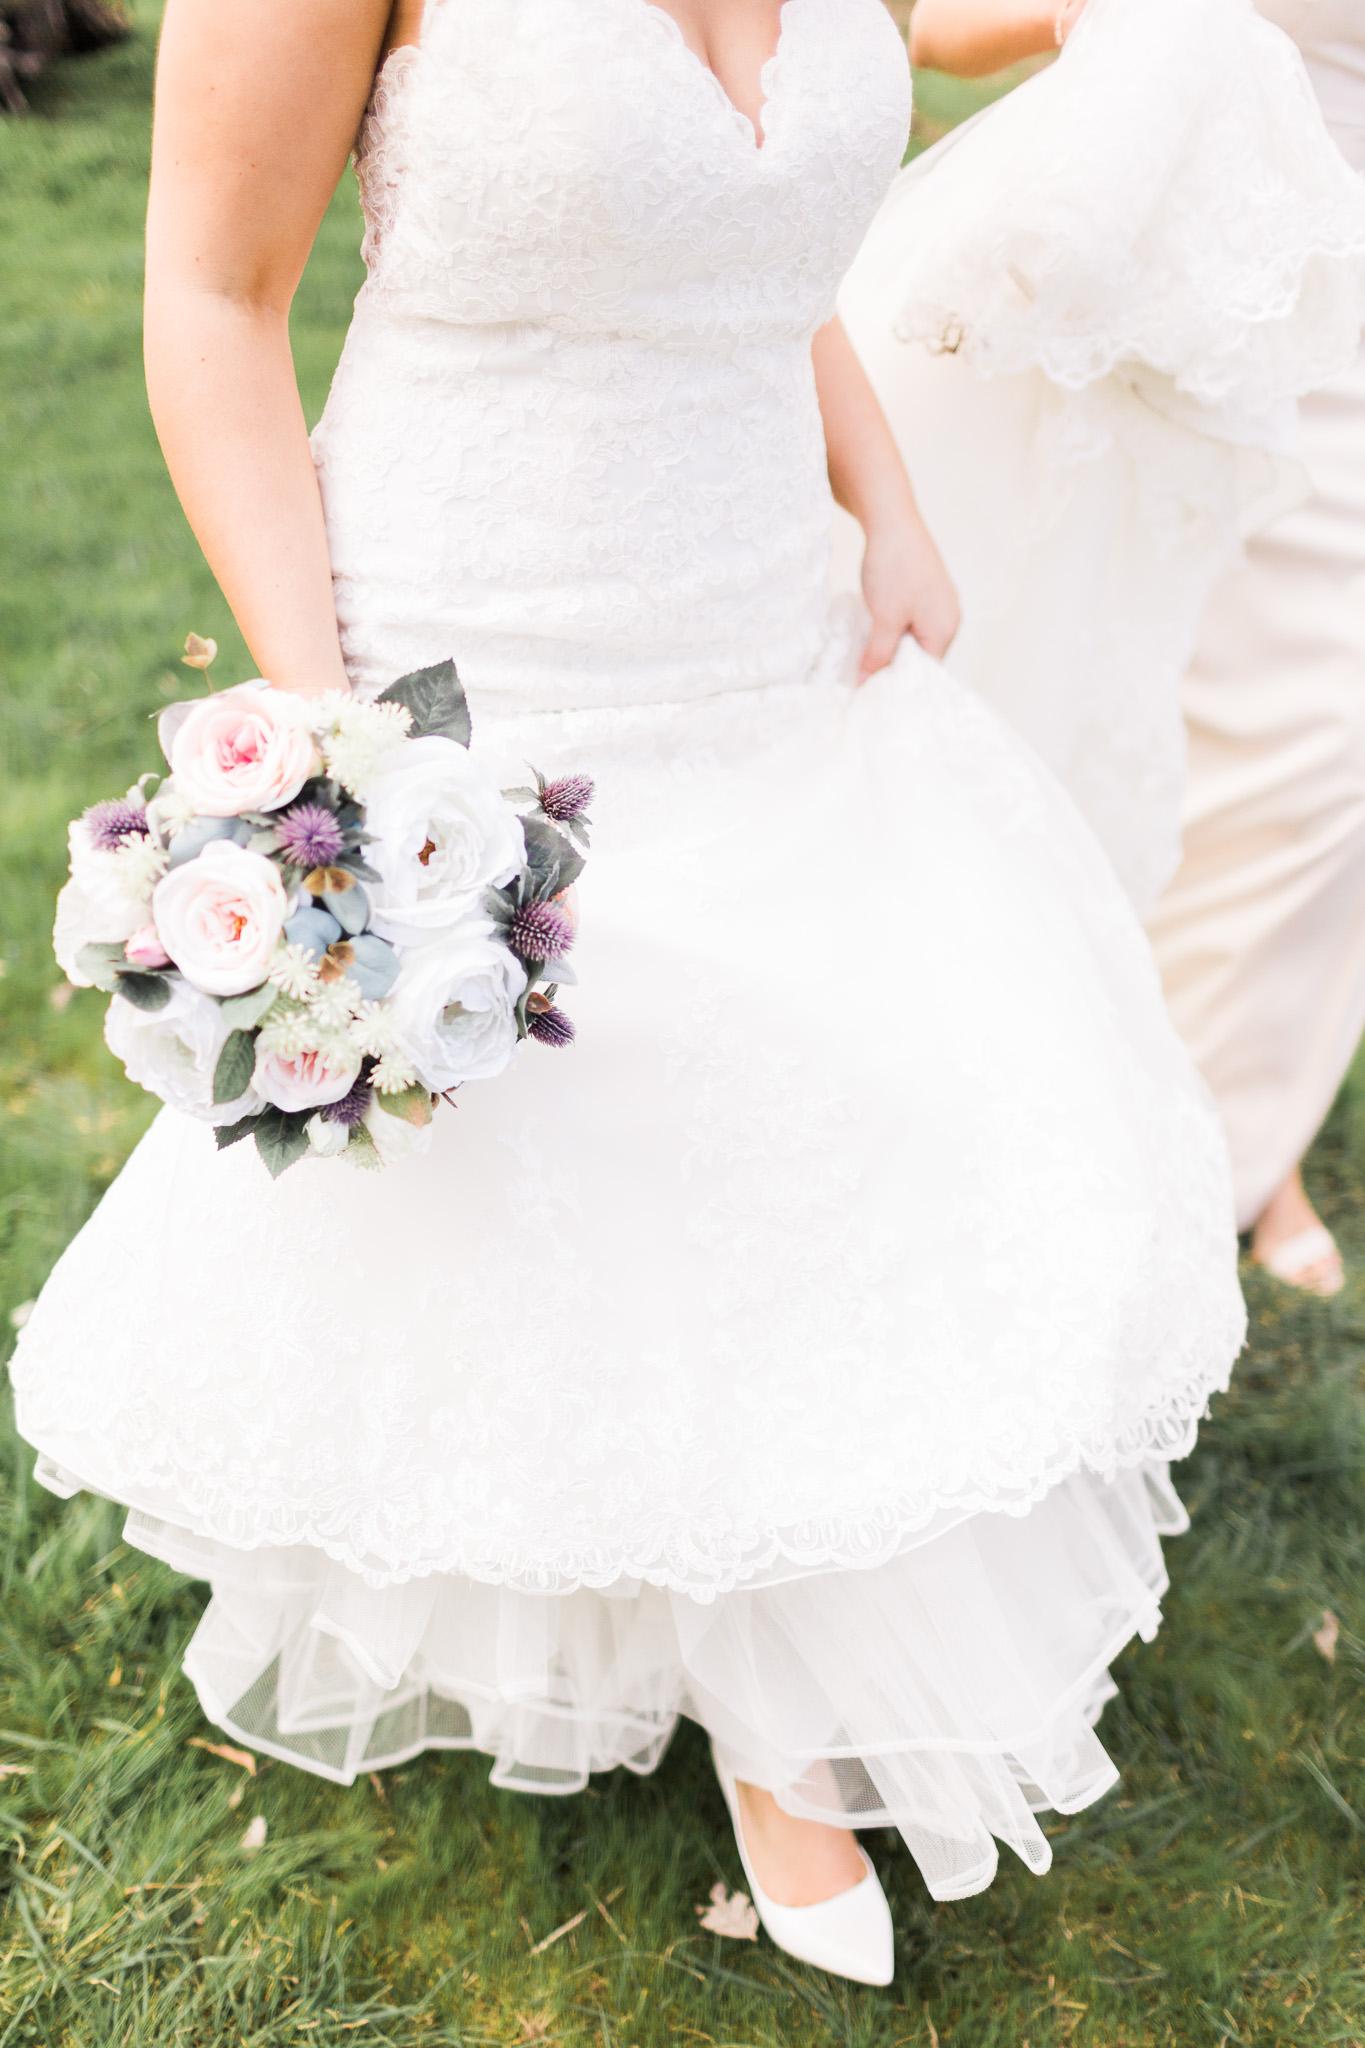 Bride walking in her wedding dress - Gold Creek Station Wedding